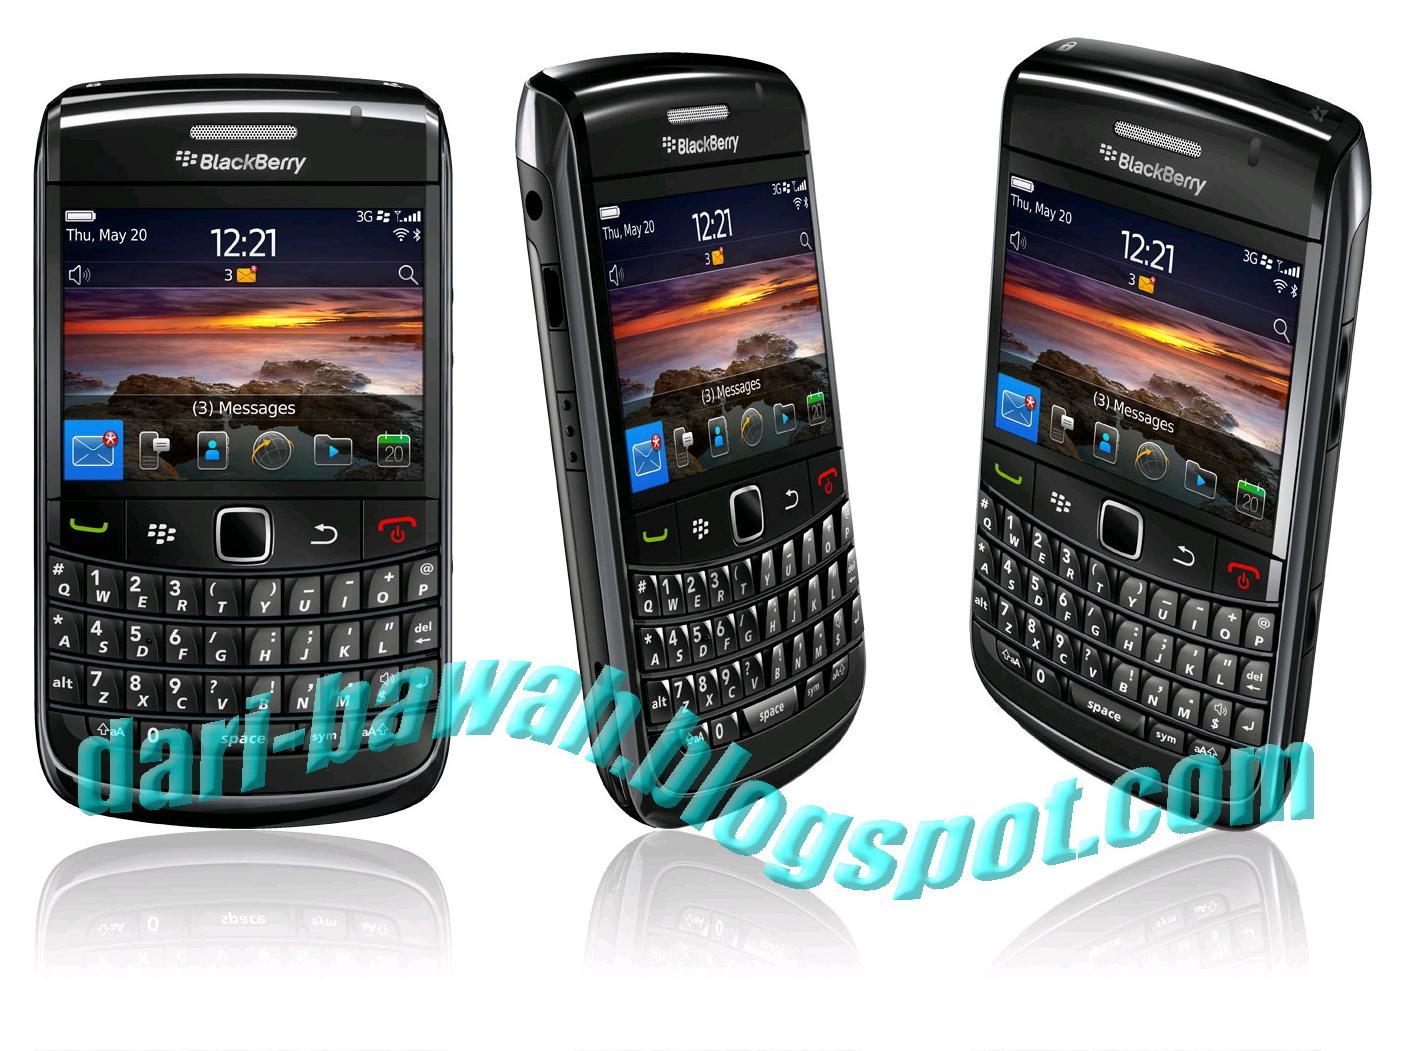 http://3.bp.blogspot.com/-MGV705vgdqE/TjnFjRaMAfI/AAAAAAAAASY/QOH_uhcU9TU/s1600/Blackberry-Bold-9780-1.jpg